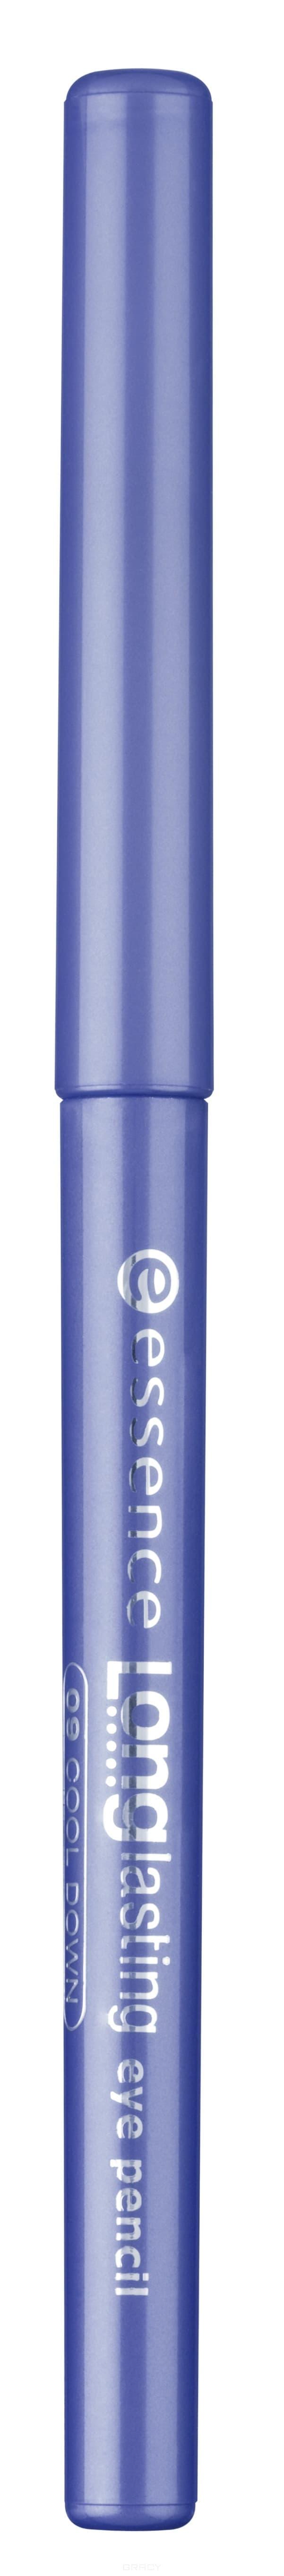 Купить Essence, Карандаш для глаз Long Lasting, 0.28 гр (15 цветов) №09, синий